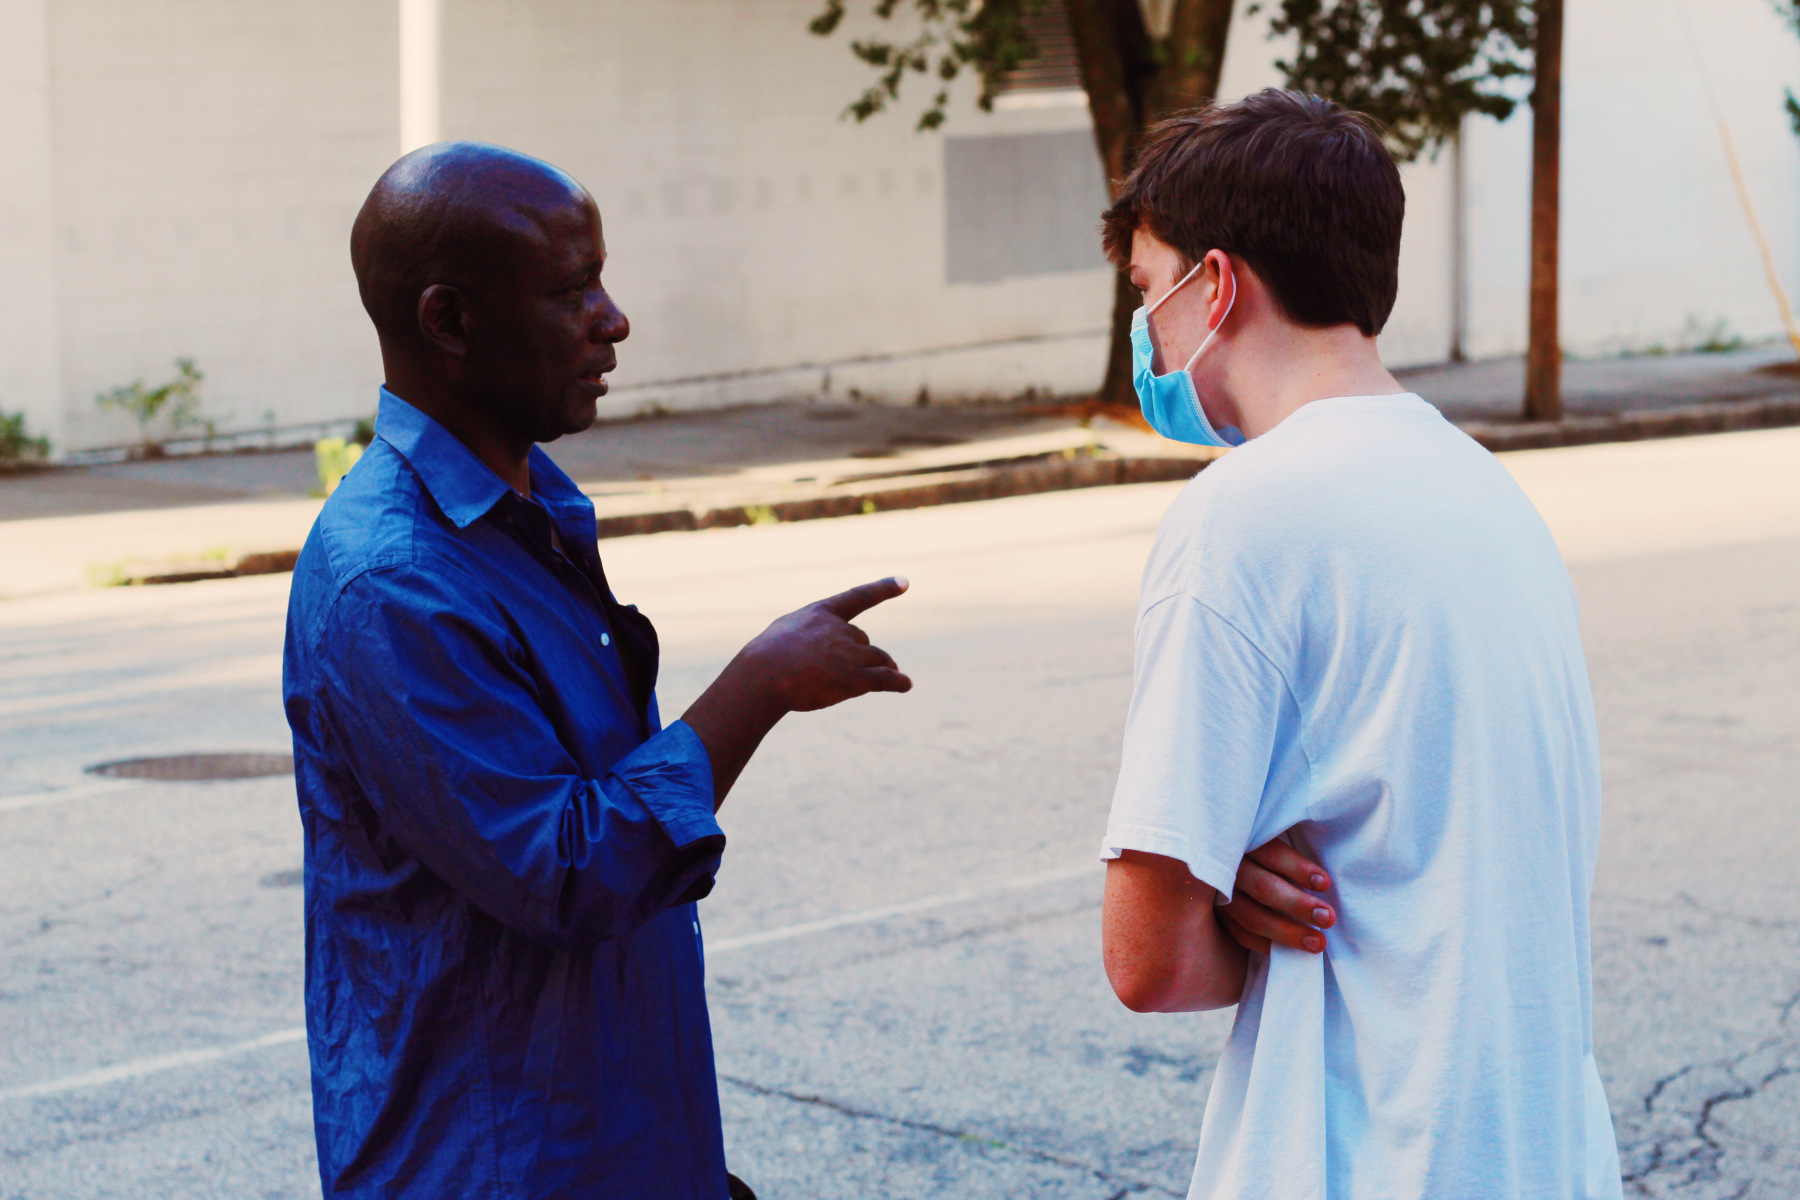 We had great conversations